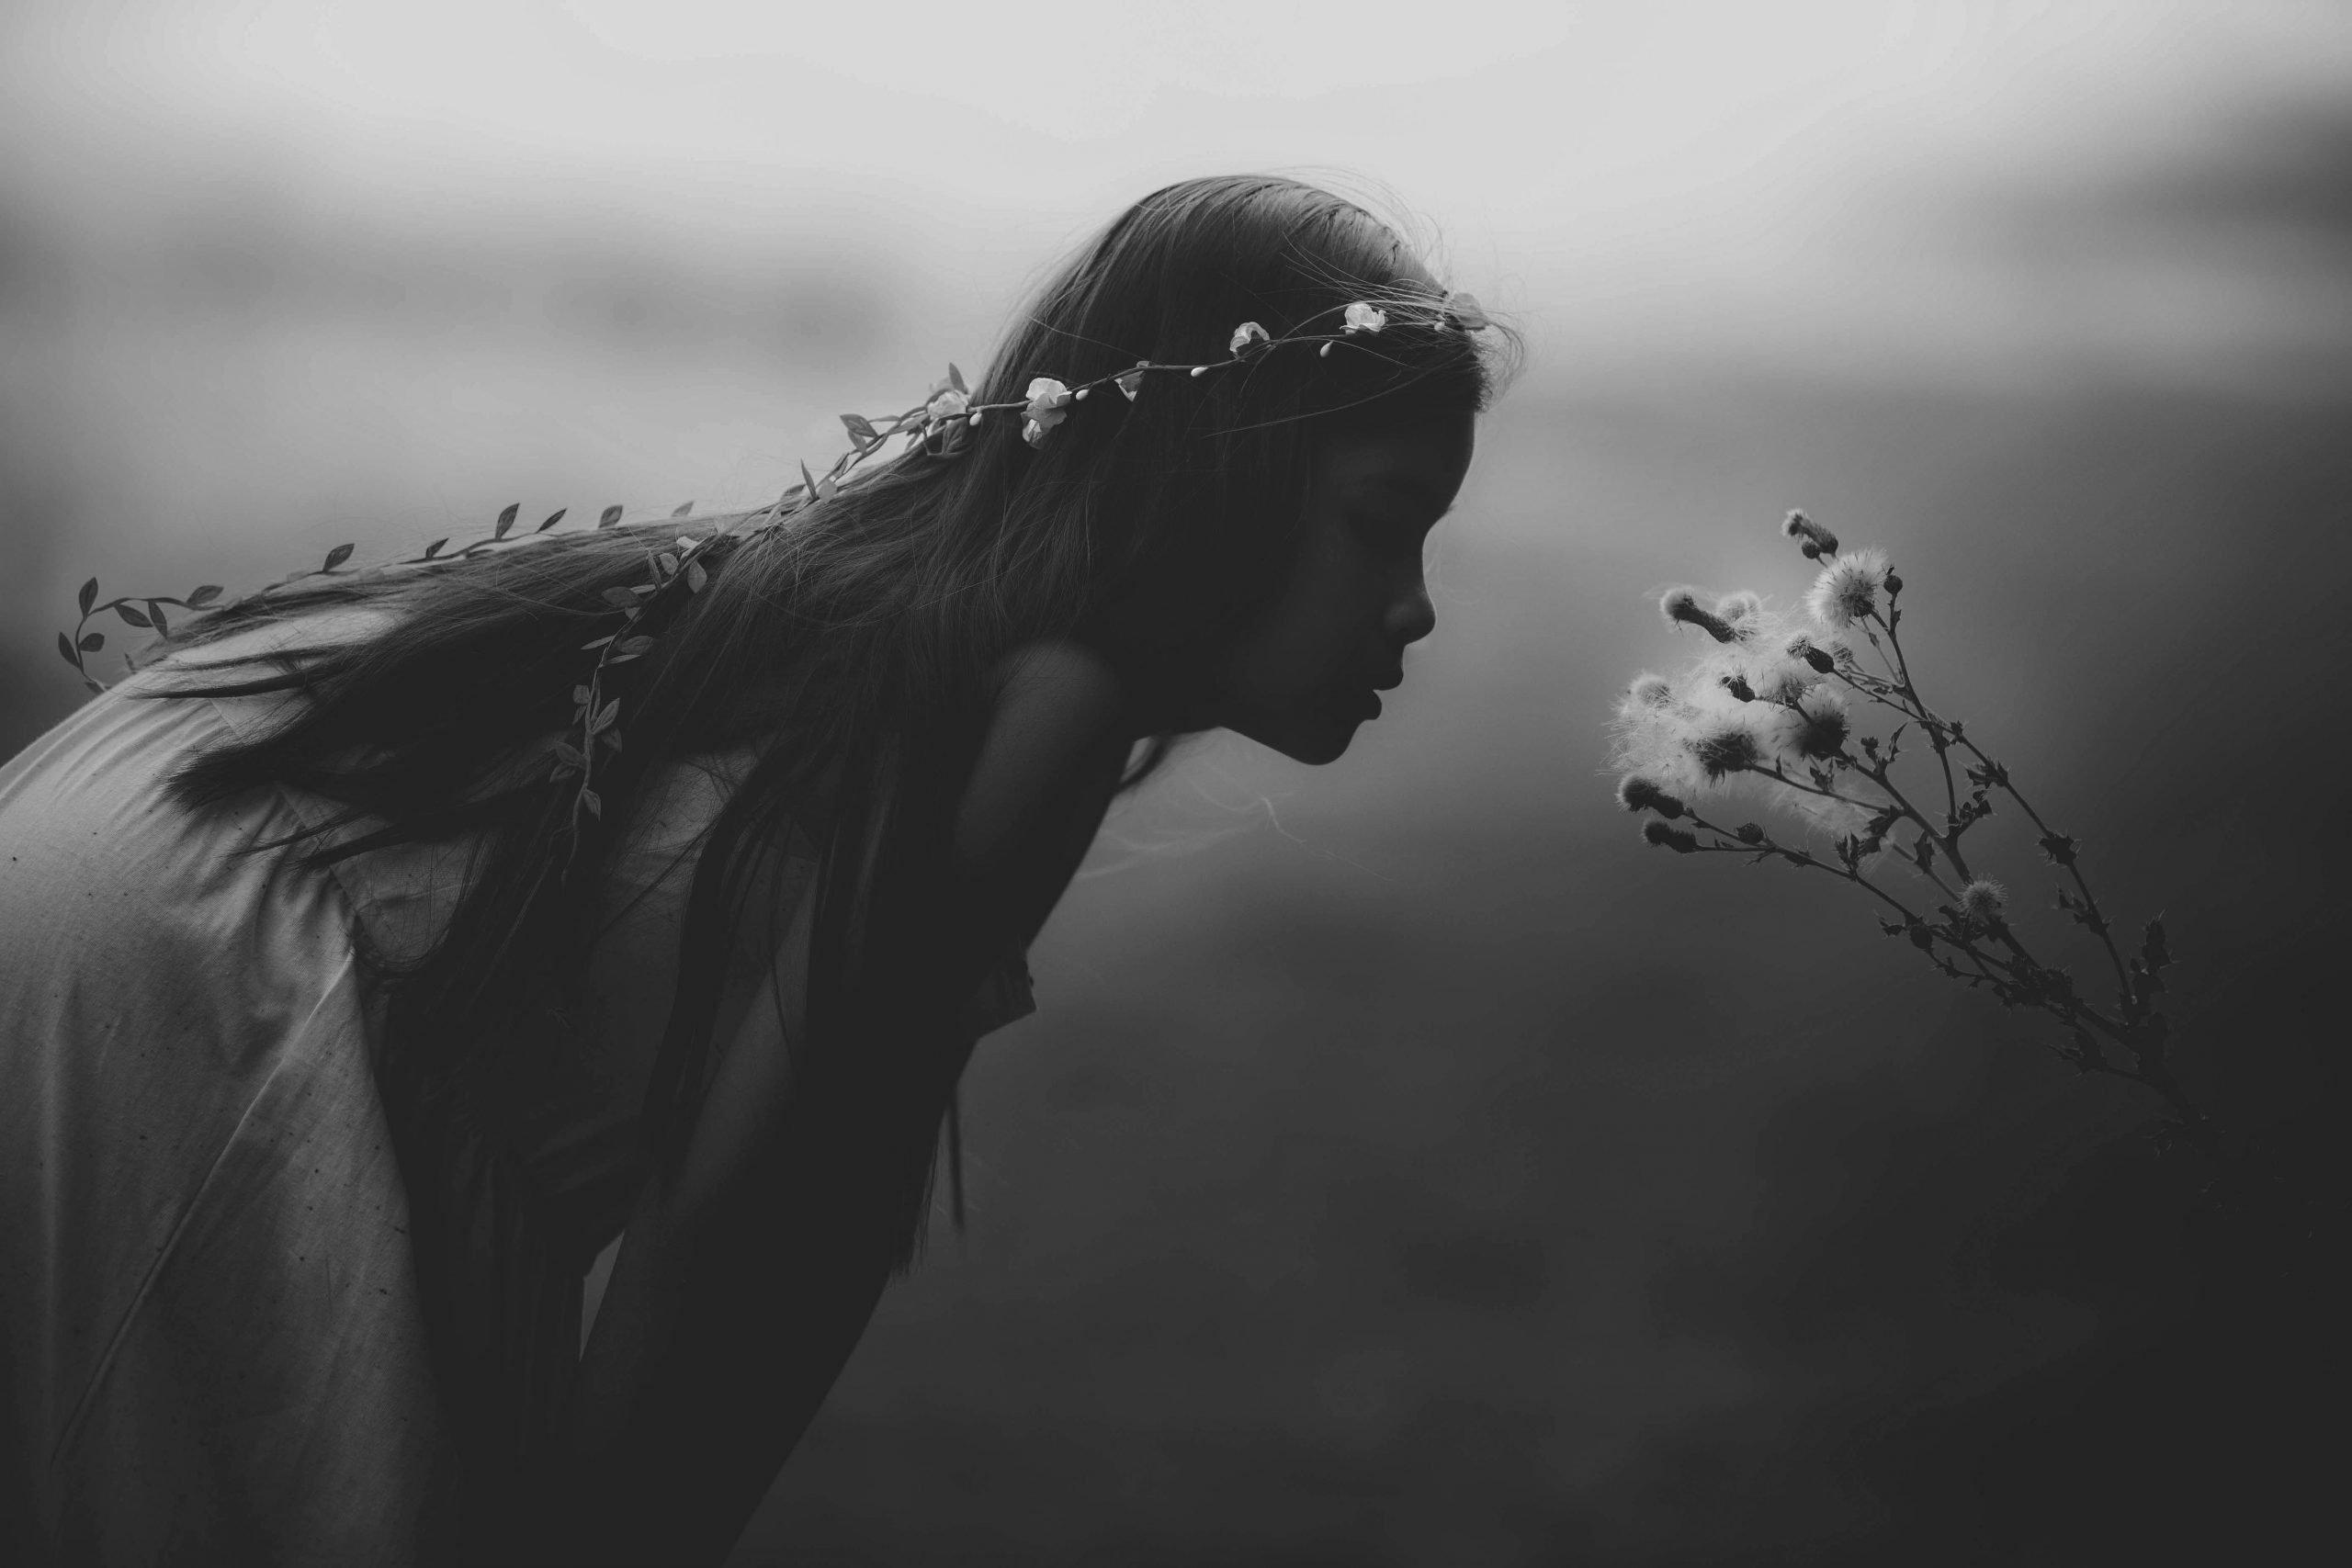 girl smells blossom